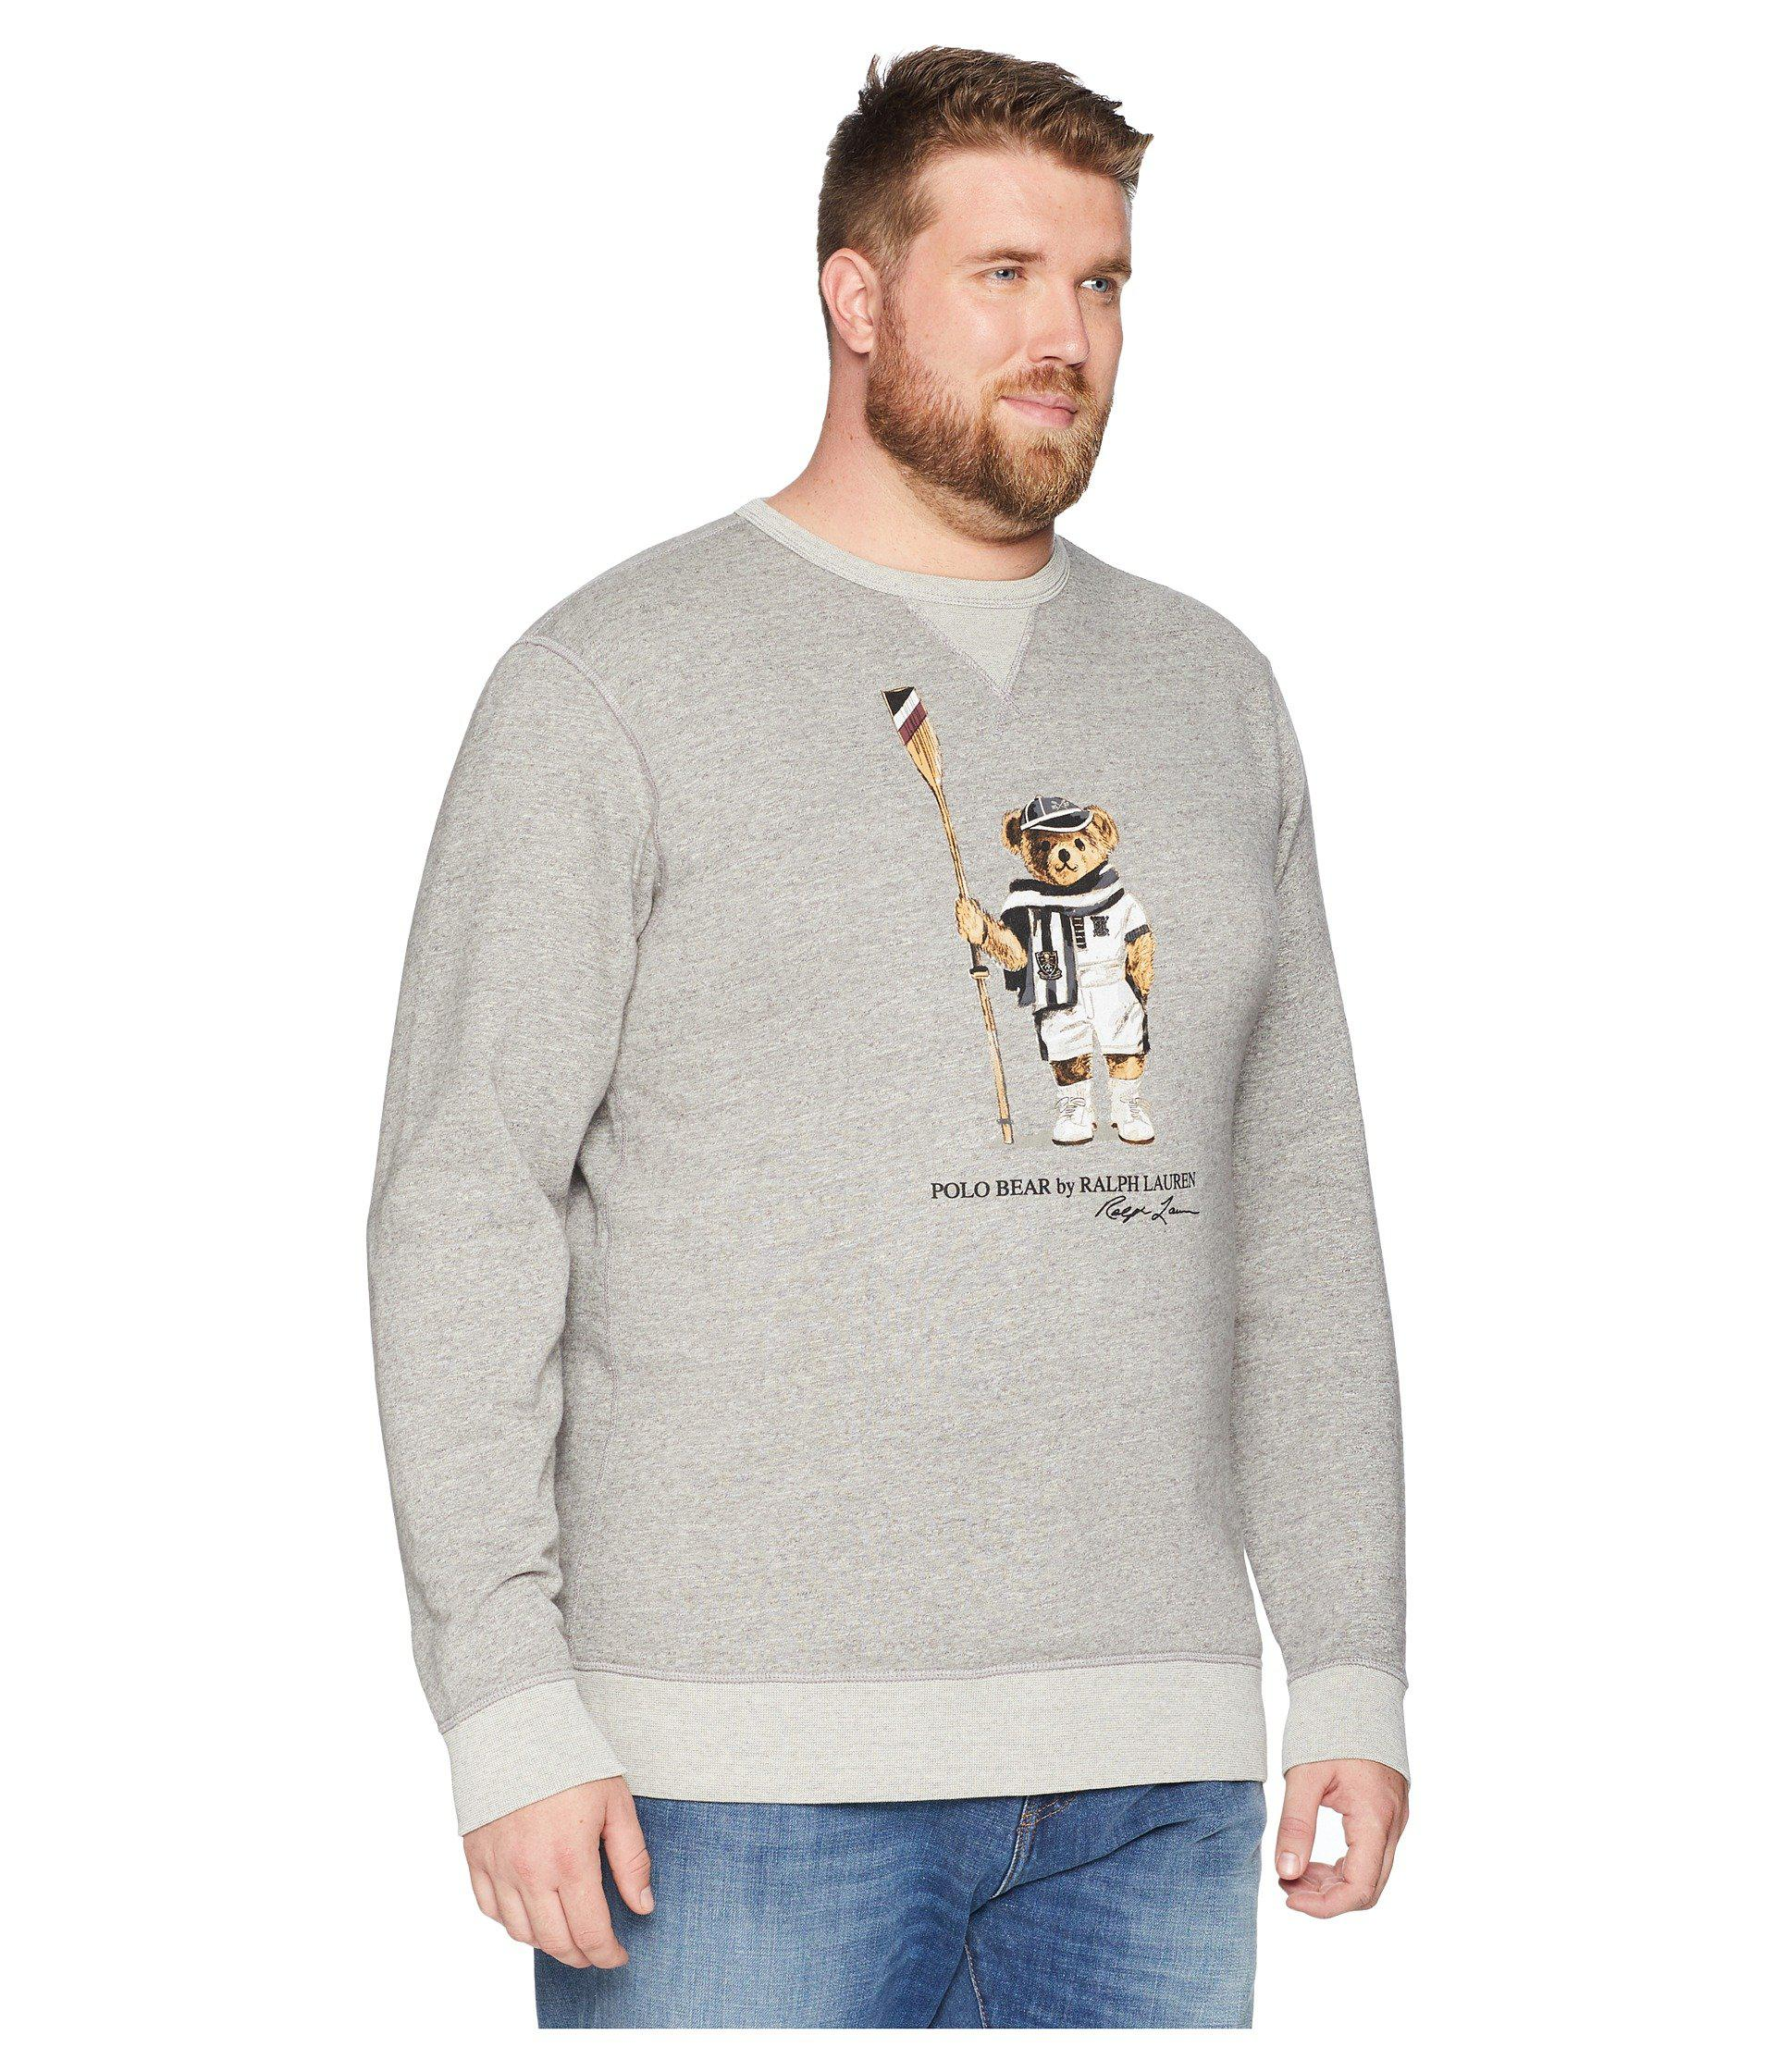 10a86033 Polo Ralph Lauren Big Tall Vintage Polo Bear Fleece Sweatshirt ...